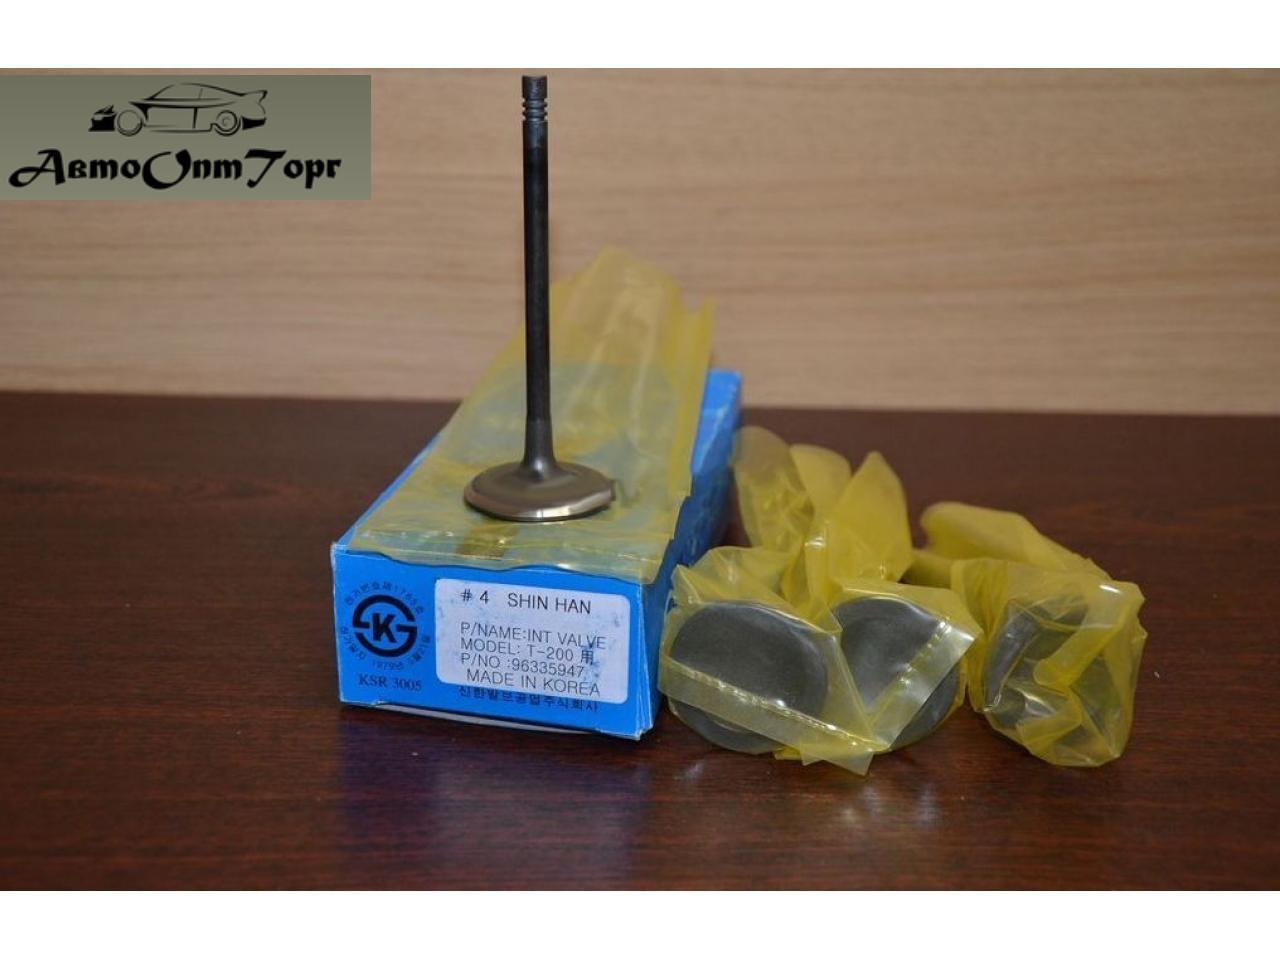 Клапана впускные Freccia на Chevrolet Aveo 1.5, model: R6399SNT, произ-во: General Motors (GM), кат. код: 96335947; (комплект)